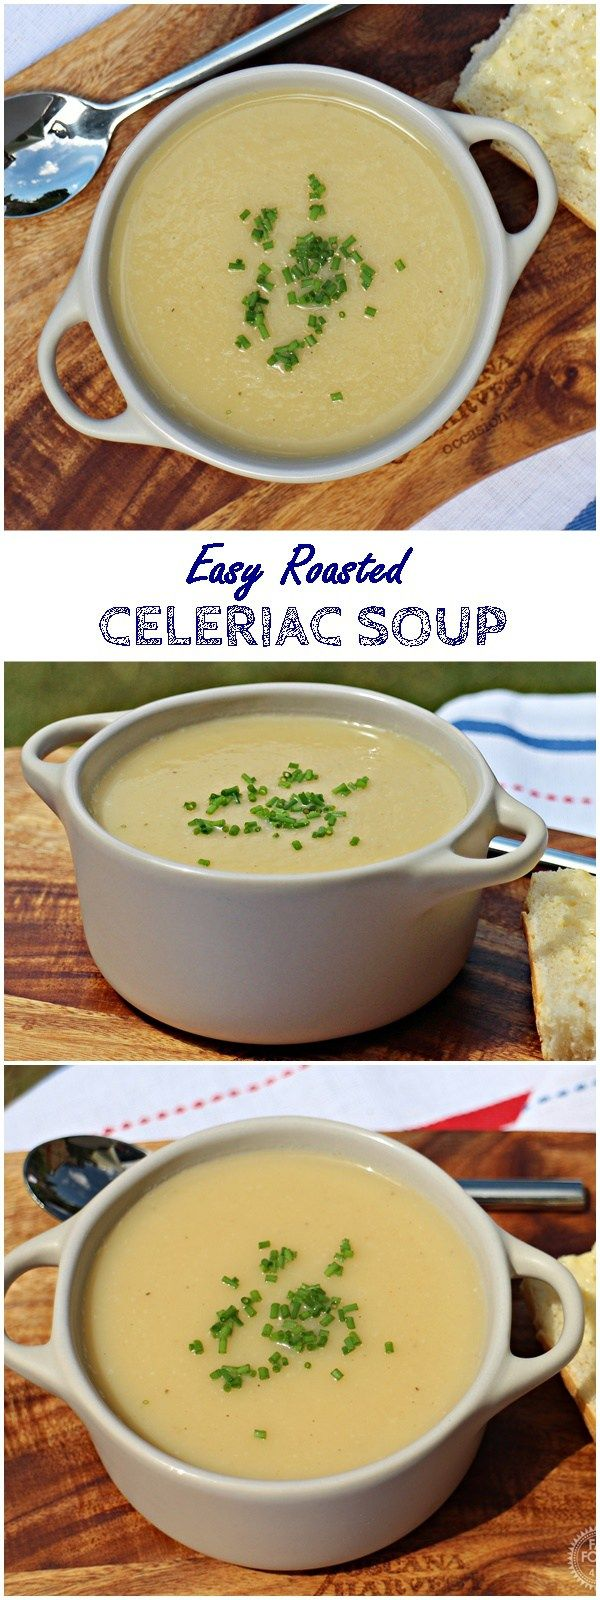 Easy Roasted Celeriac Soup - Fab Food 4 All